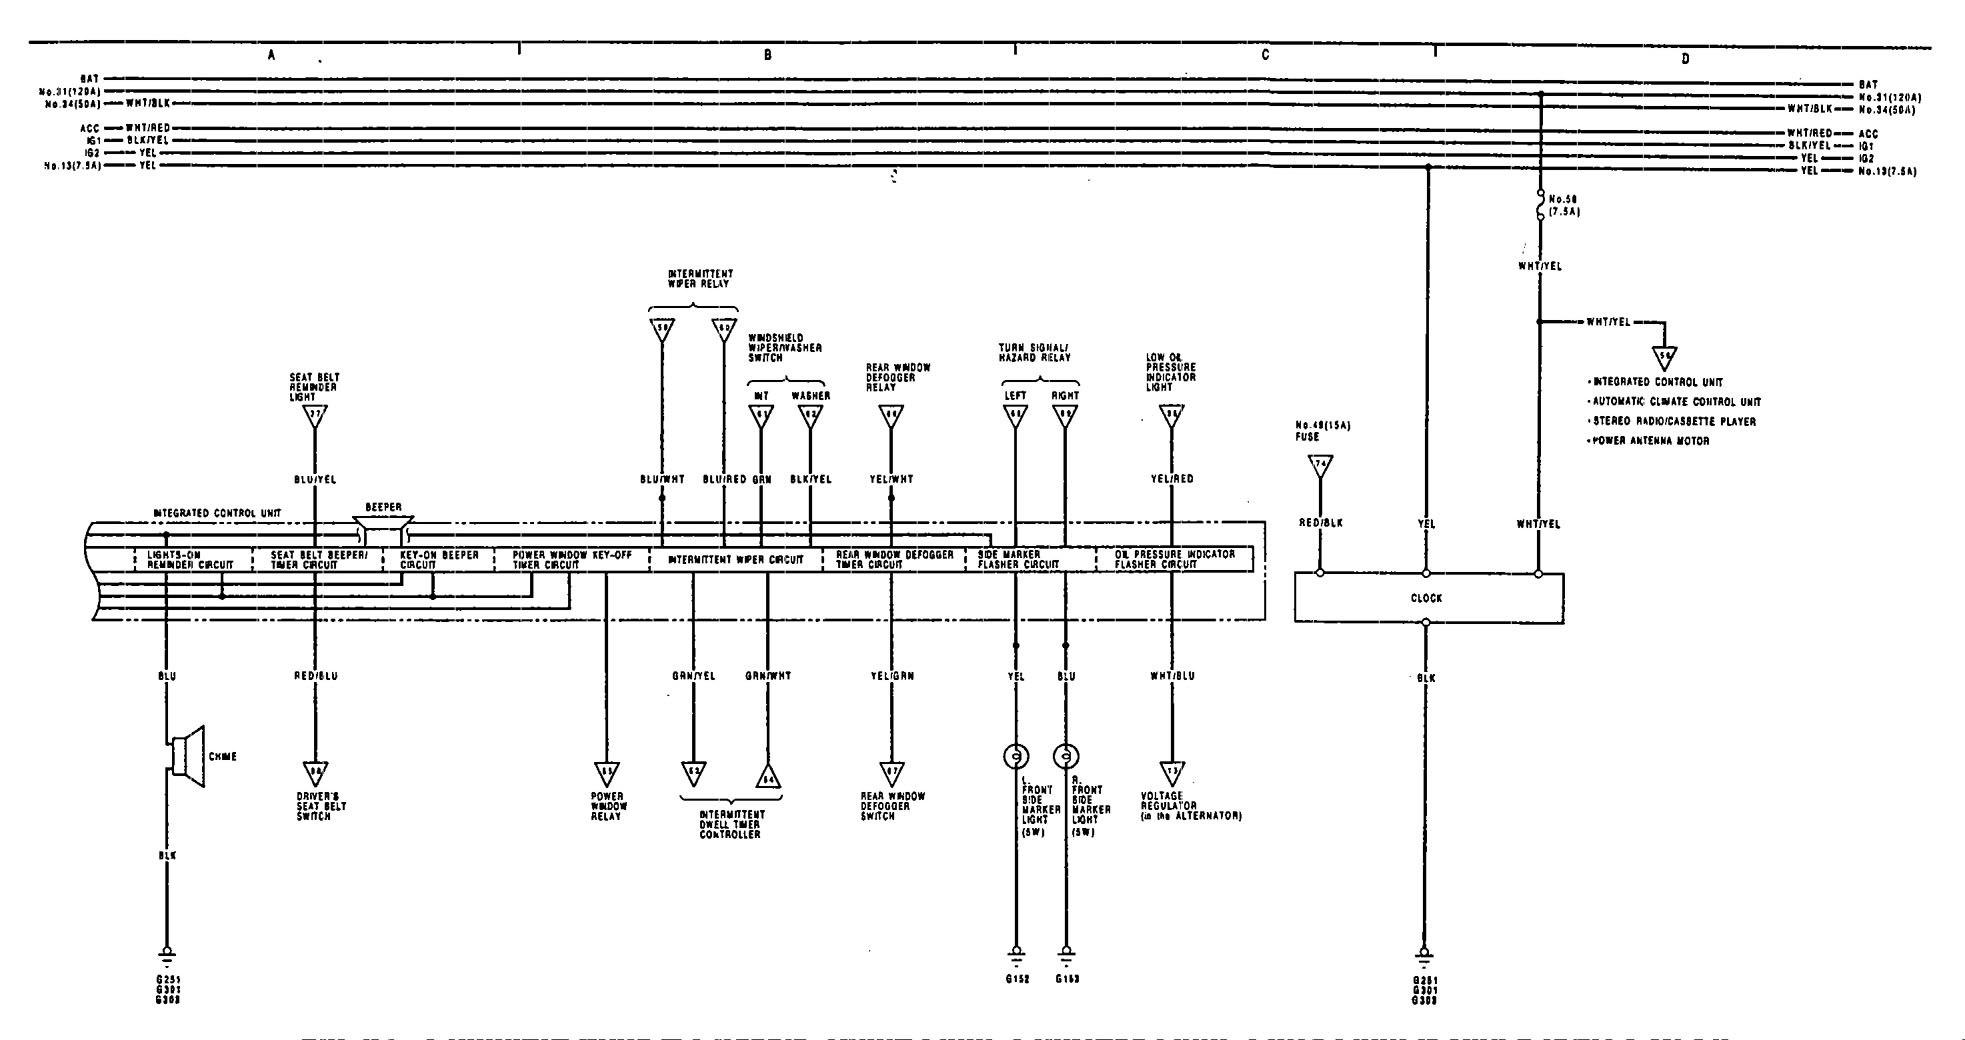 acura legend 1991 - 1992 - wiring diagram - courtesy lamp